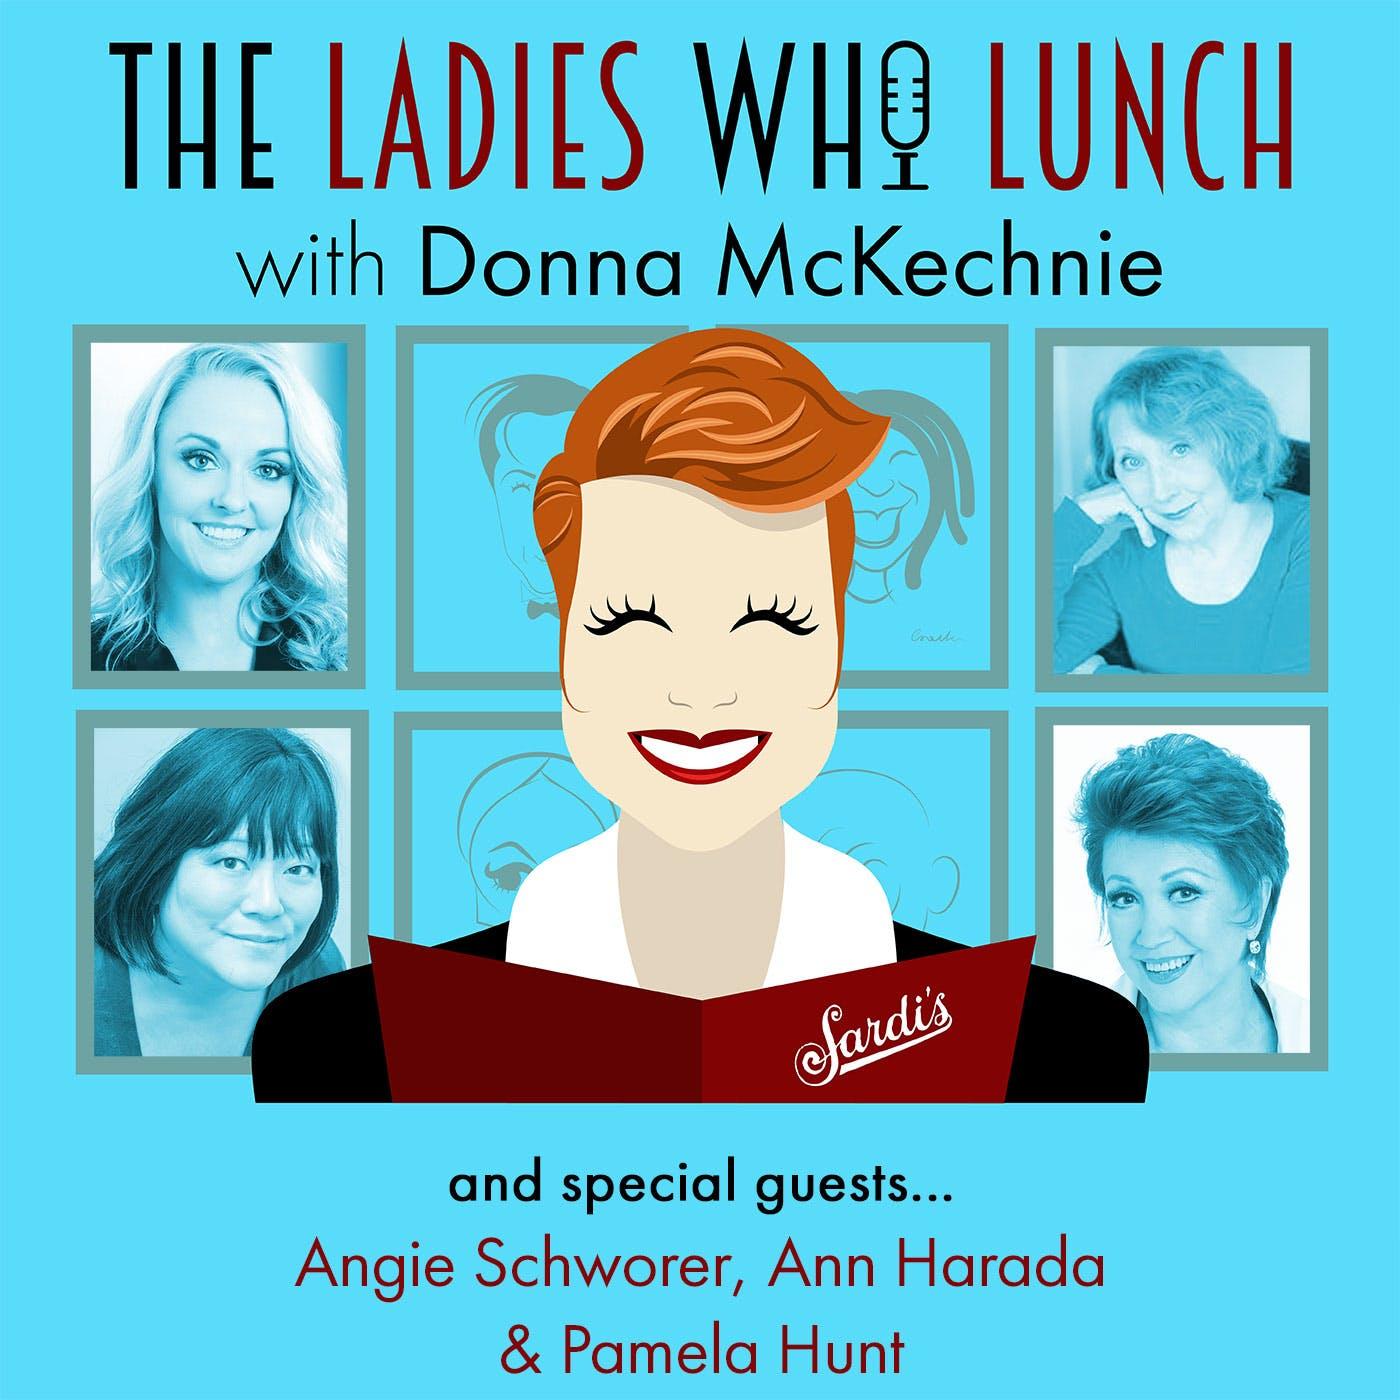 #4 - Angie Schworer, Ann Harada, and Pamela Hunt